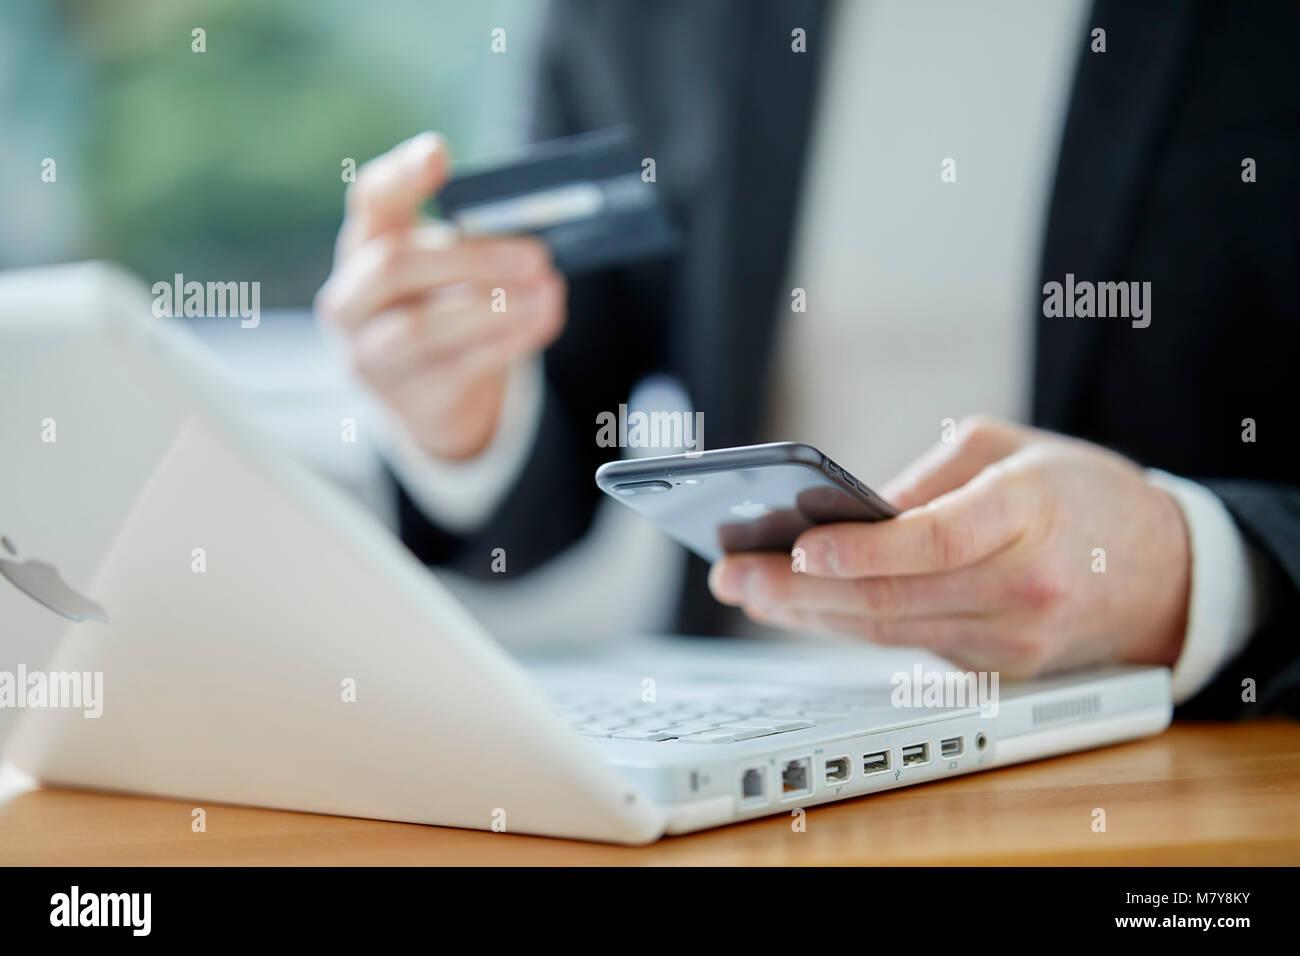 Mann mit Laptop holding Kreditkarte Stockbild